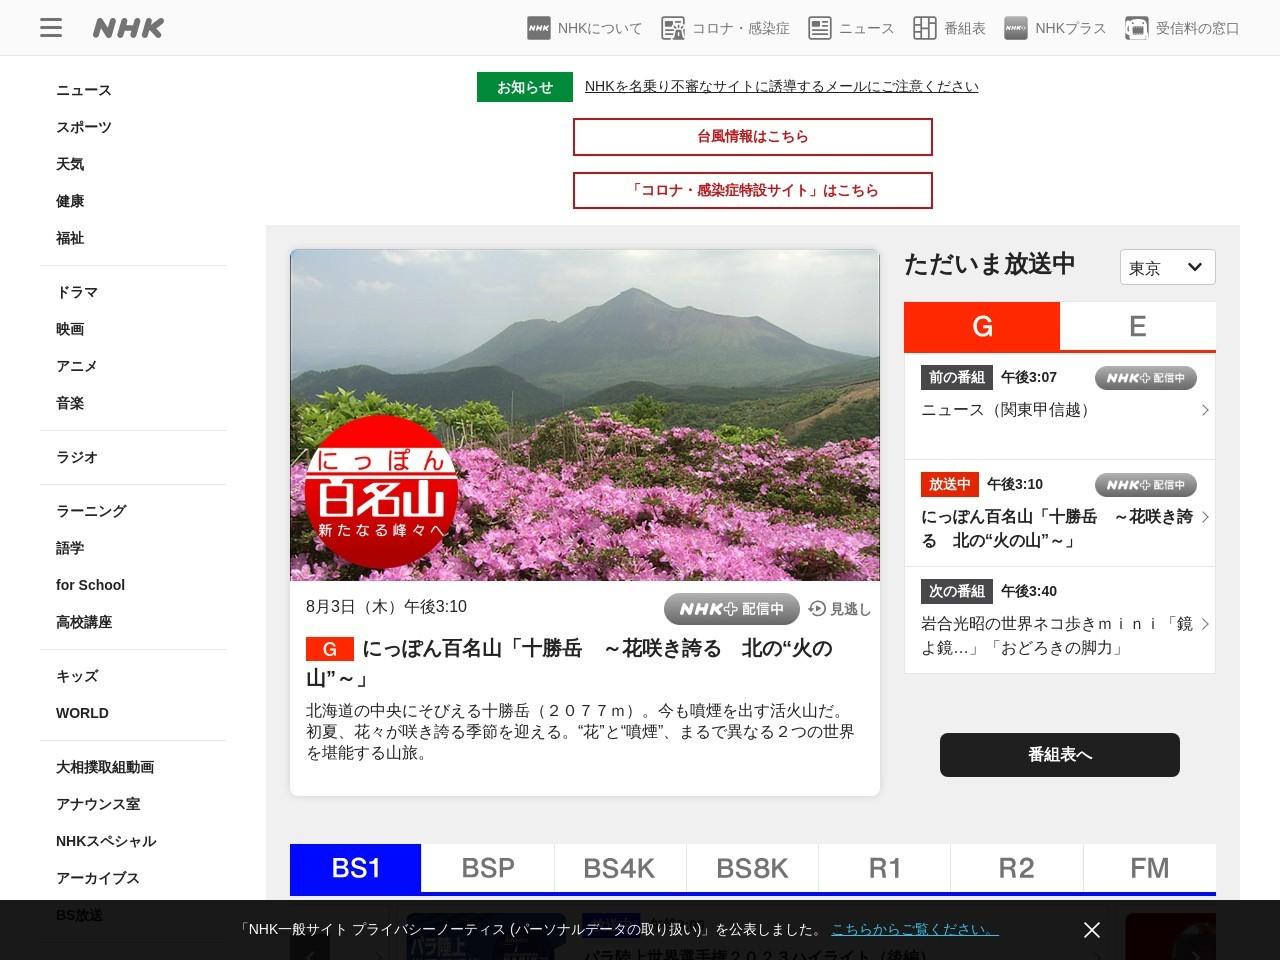 http://www.nhk.or.jp/sanadamaru/story/story04.html#mainContents